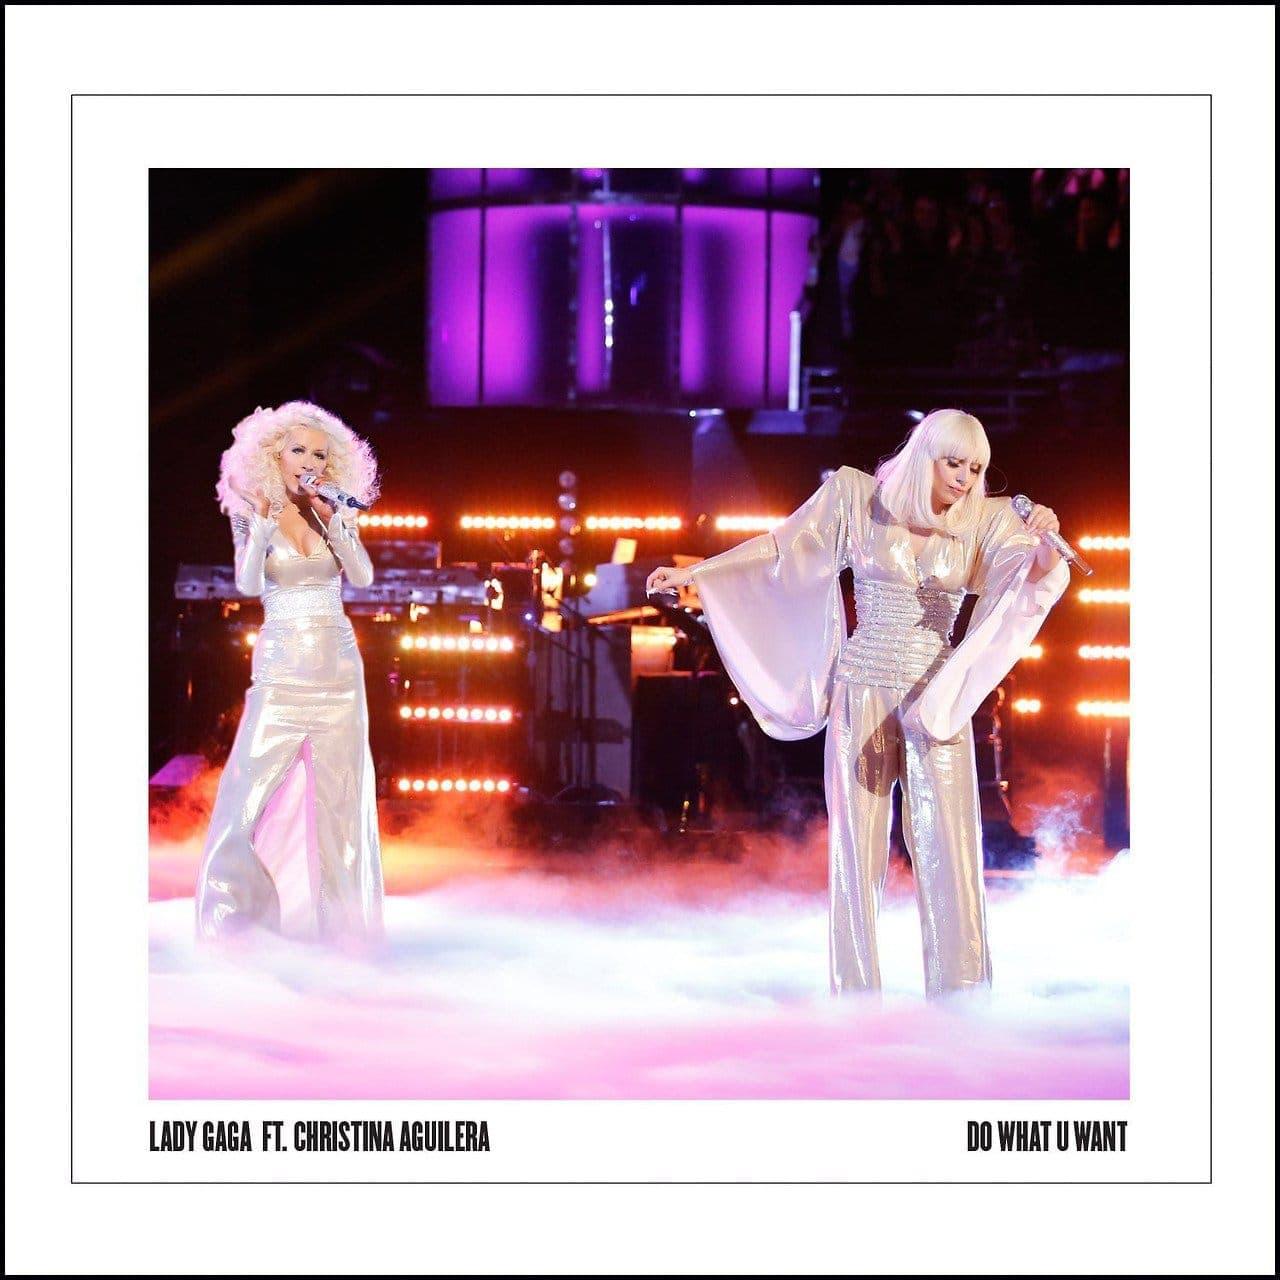 Do What U Want (feat. Christina Aguilera) - Lady Gaga